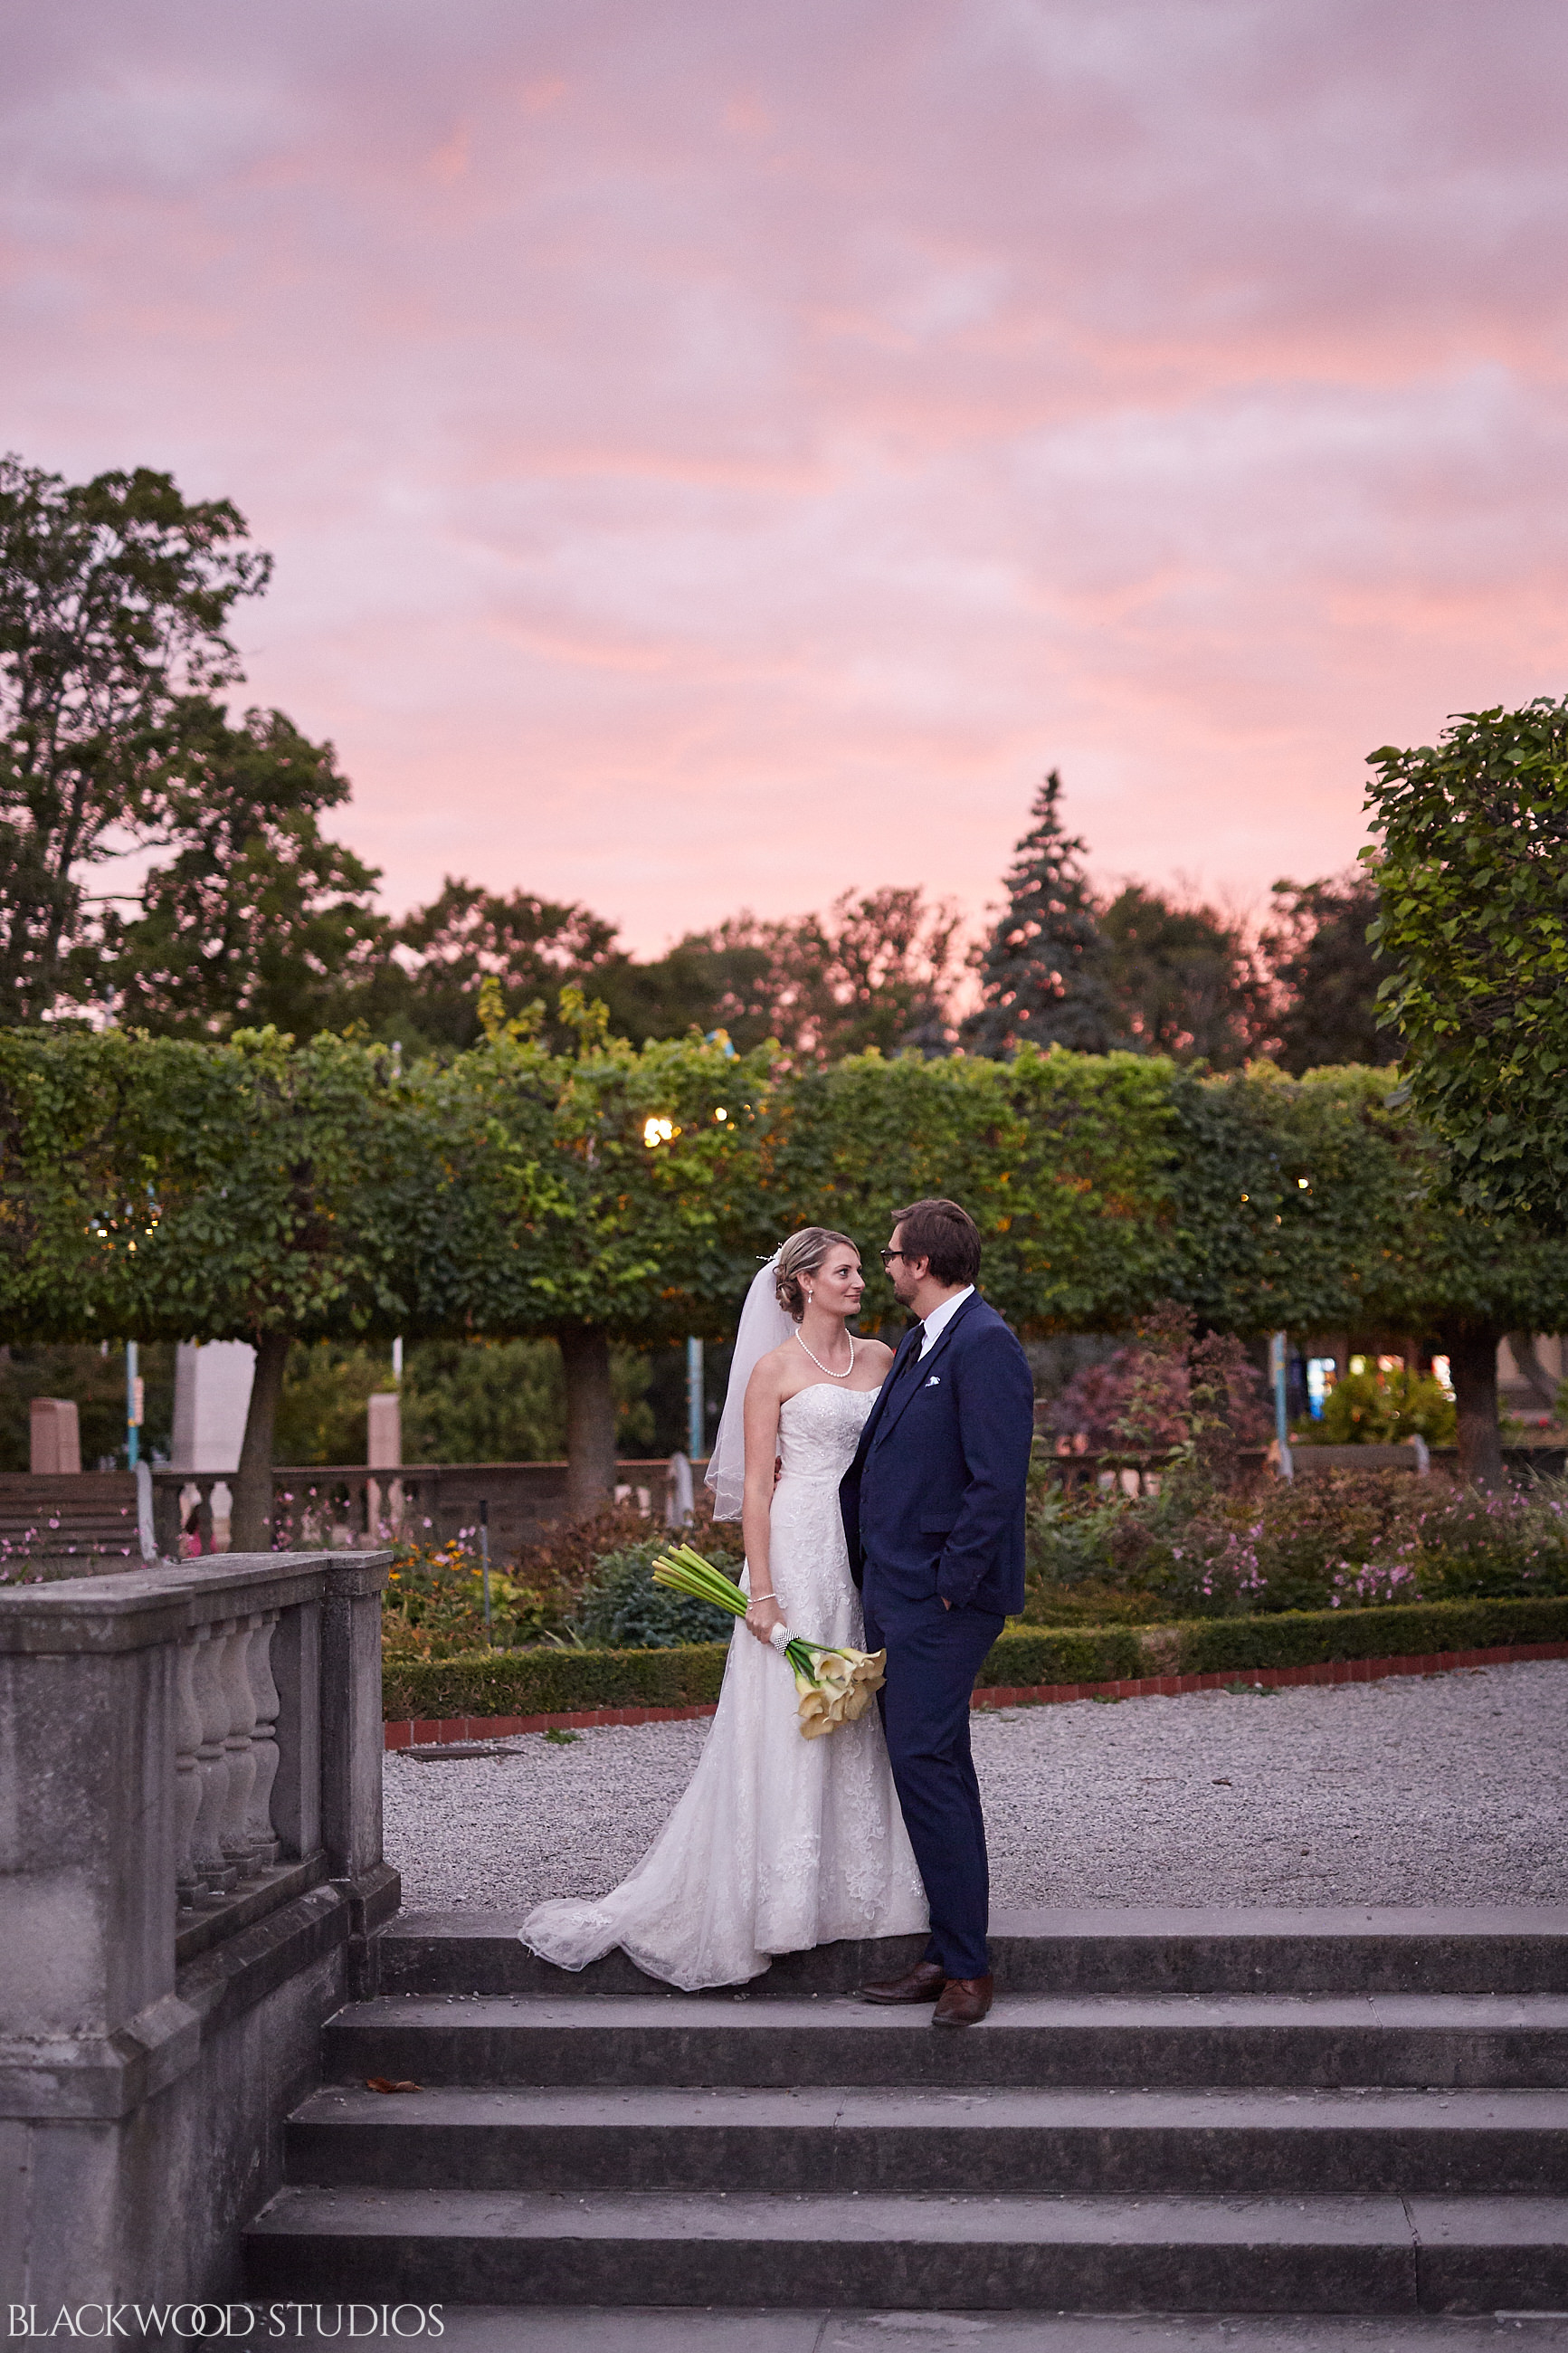 Blackwood-Studios-Wedding-Photography-20170928-190151-Marek-Katie-Michalek-Oakes-Garden-Theatre-Niagara-Falls-Ontario-Canada.jpg